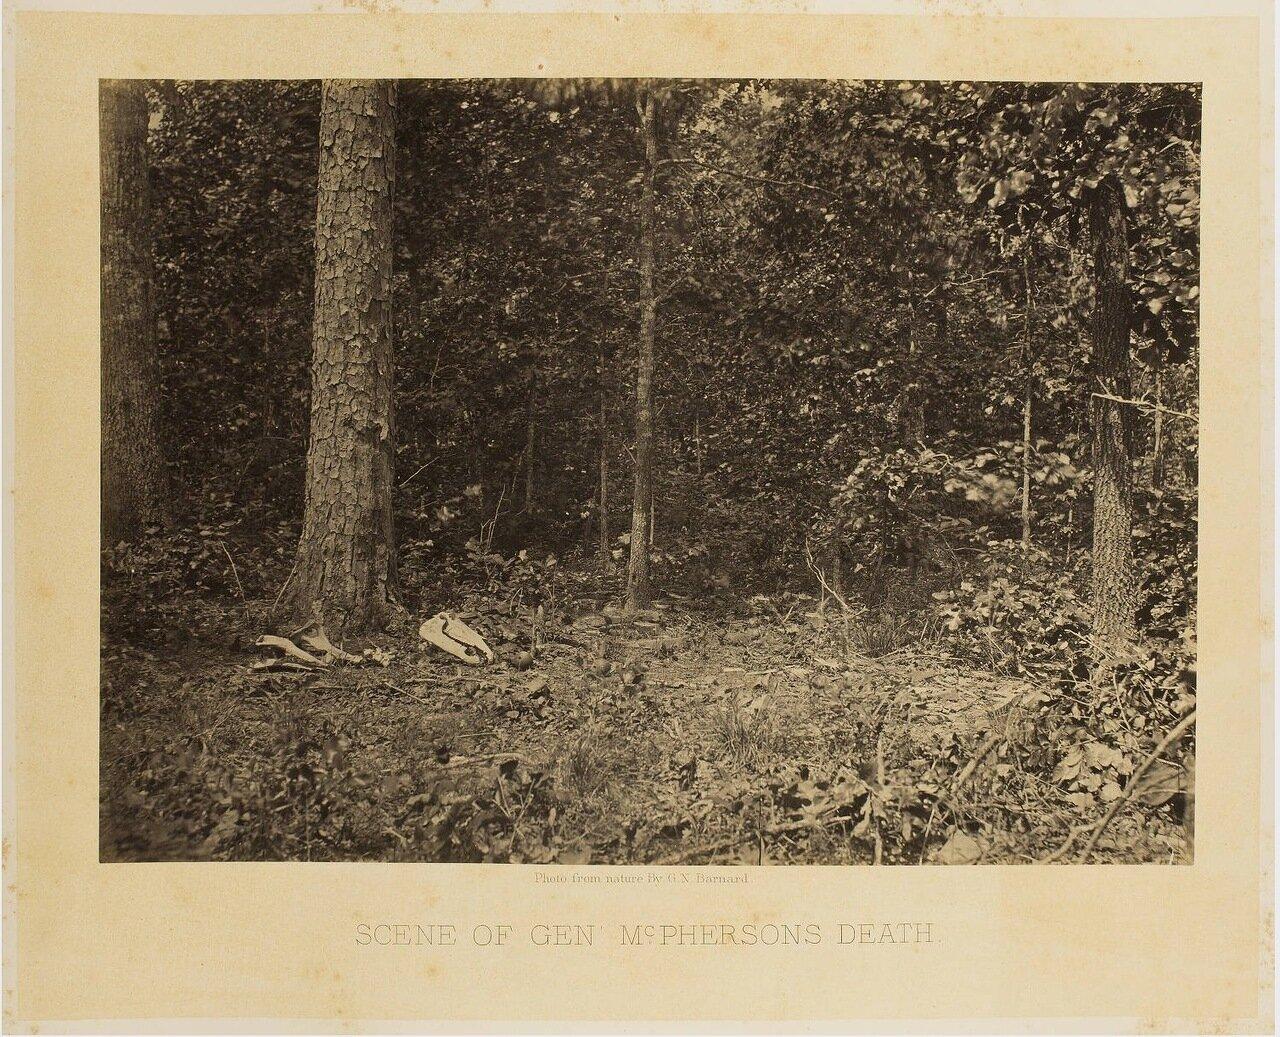 Место гибели генерала Джеймса Бердсея Макферсона